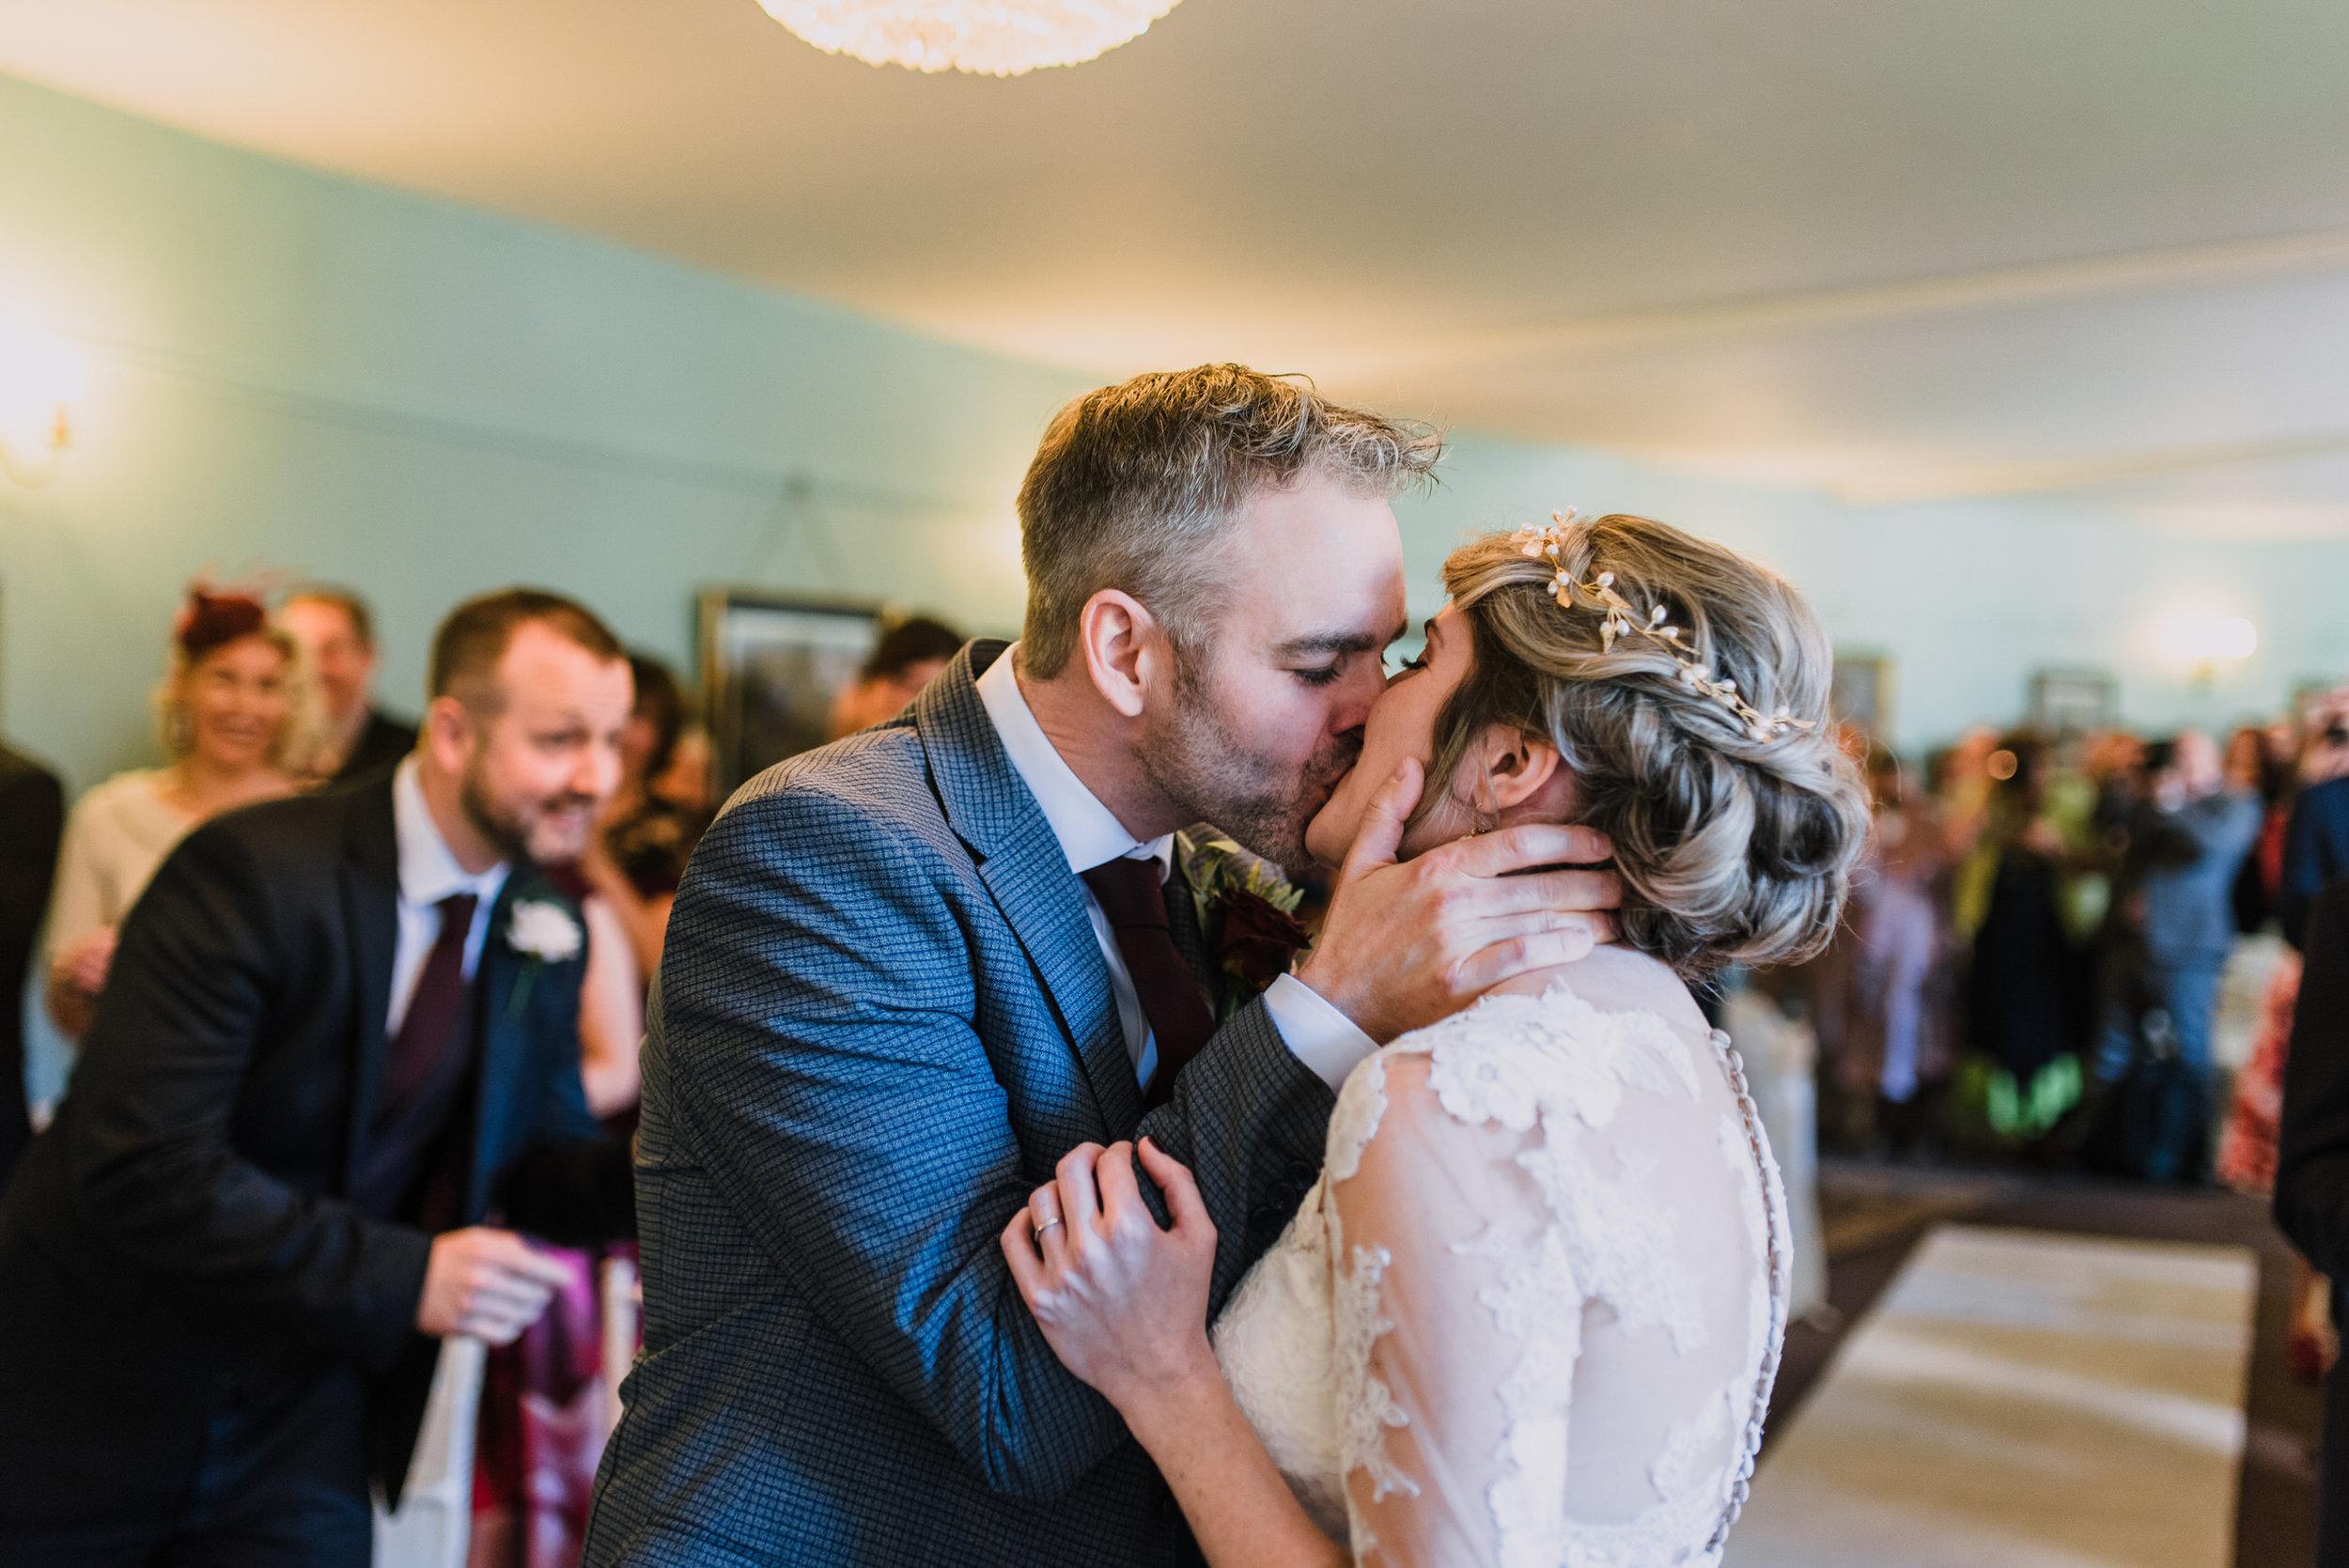 lissanoure castle wedding, northern ireland wedding photographer, romantic northern irish wedding venue, castle wedding ireland, natural wedding photography ni (58).jpg